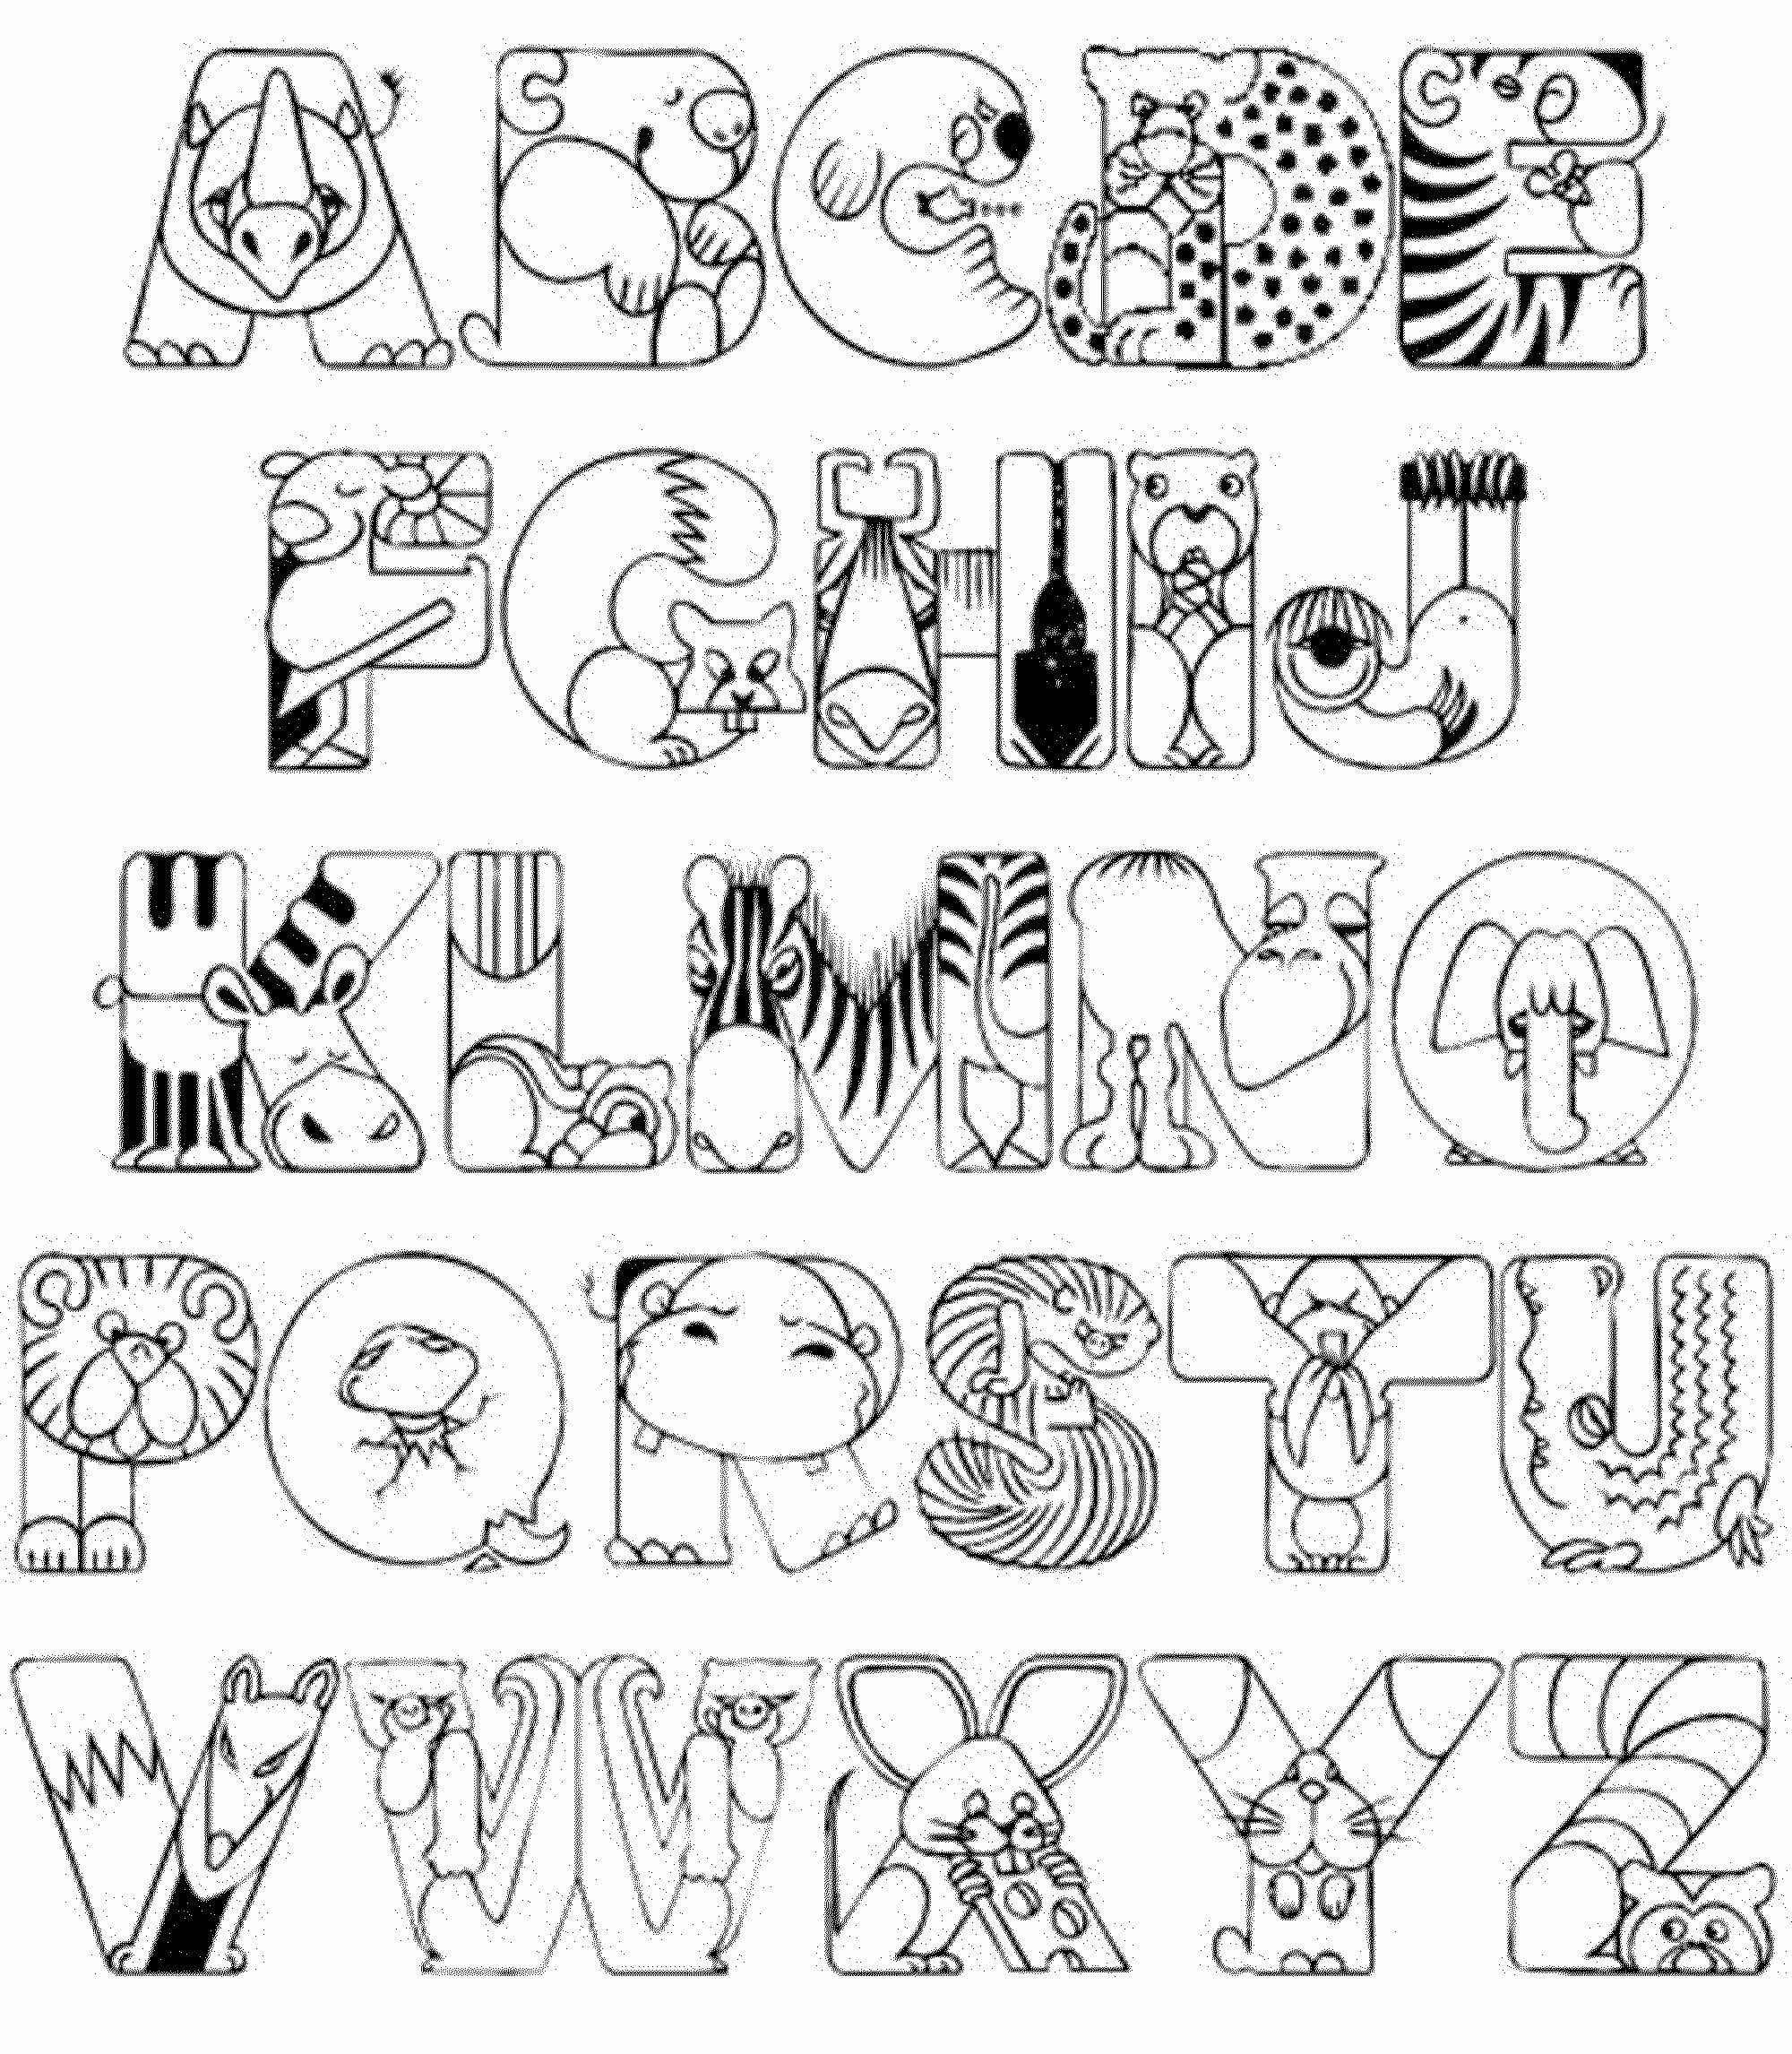 Pin By Les Basset On Lettering Kindergarten Coloring Pages Abc Coloring Pages Abc Coloring